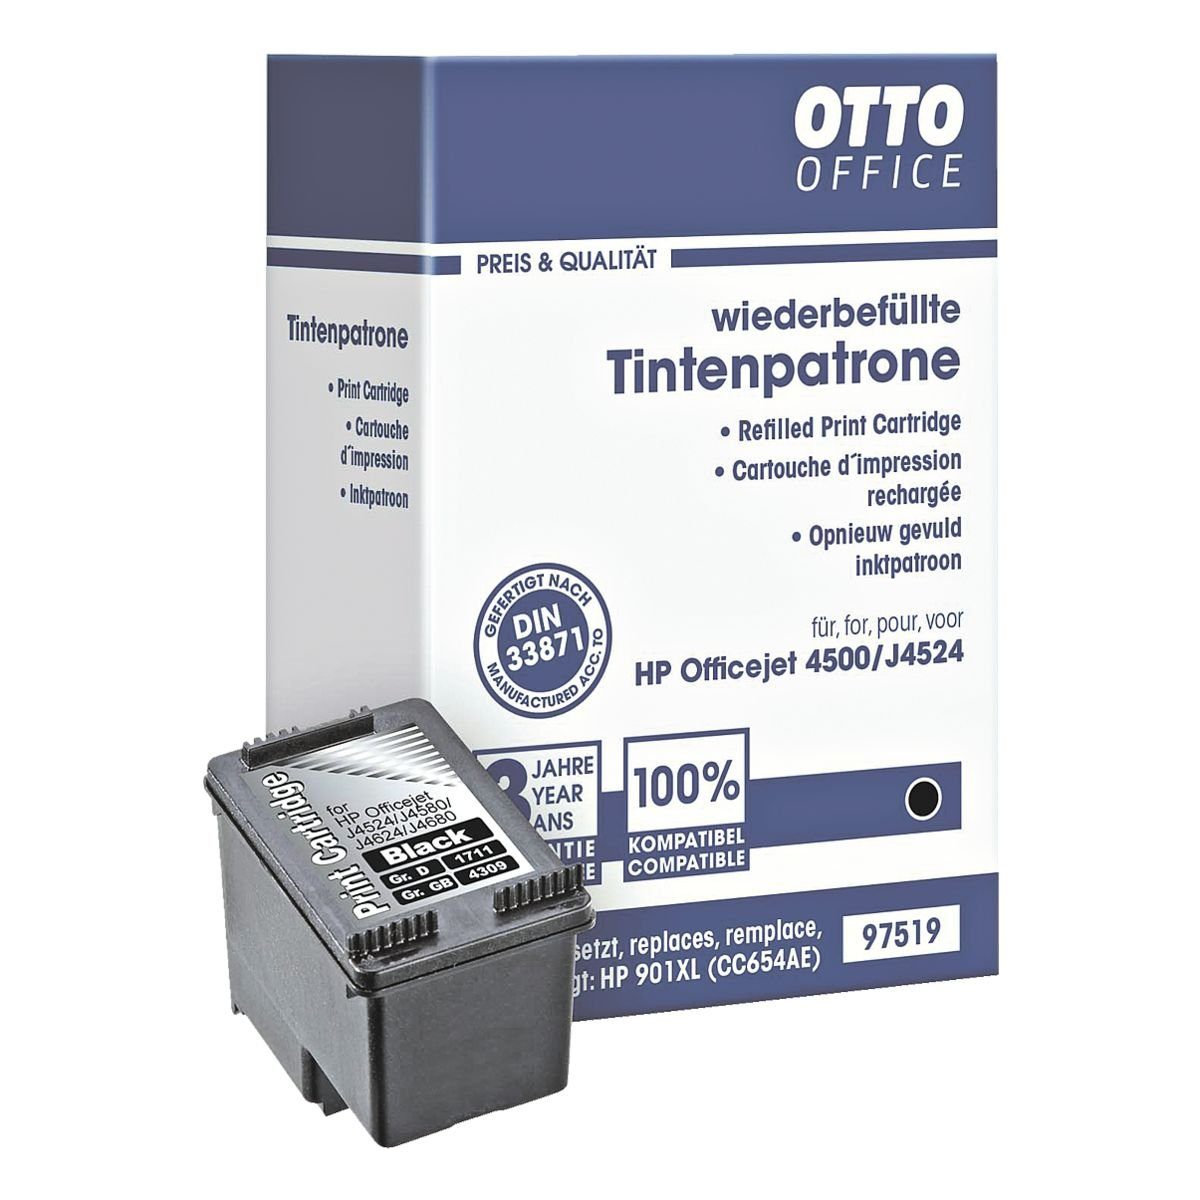 OTTO Office Tintenpatrone ersetzt HP »CC654AE« Nr. 901XL